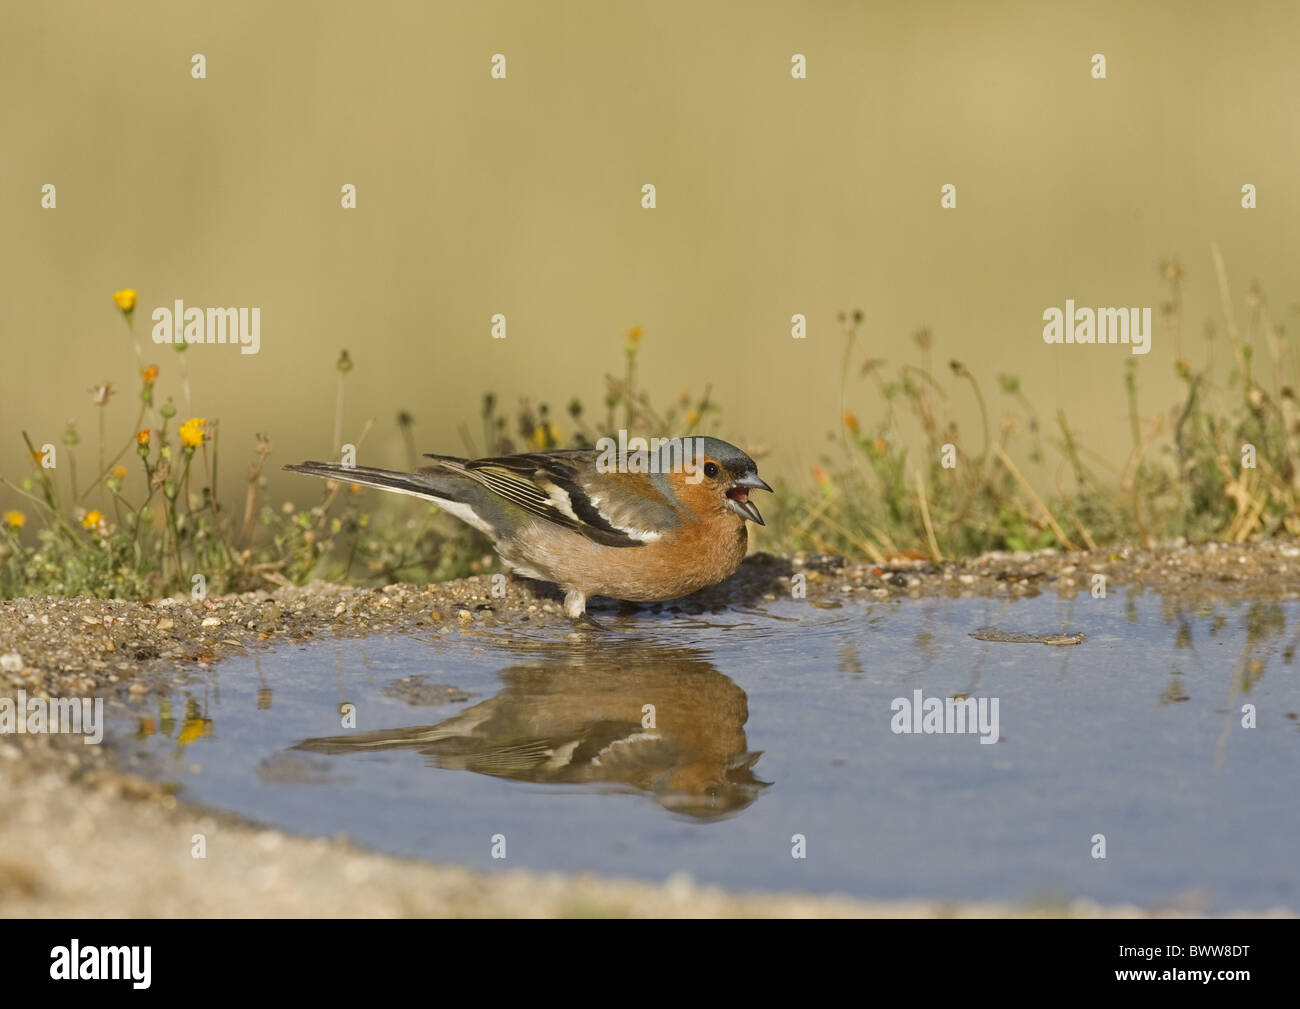 Chaffinch (Fringilla coelebs) adult male, aggressive display at edge of pool, Spain - Stock Image